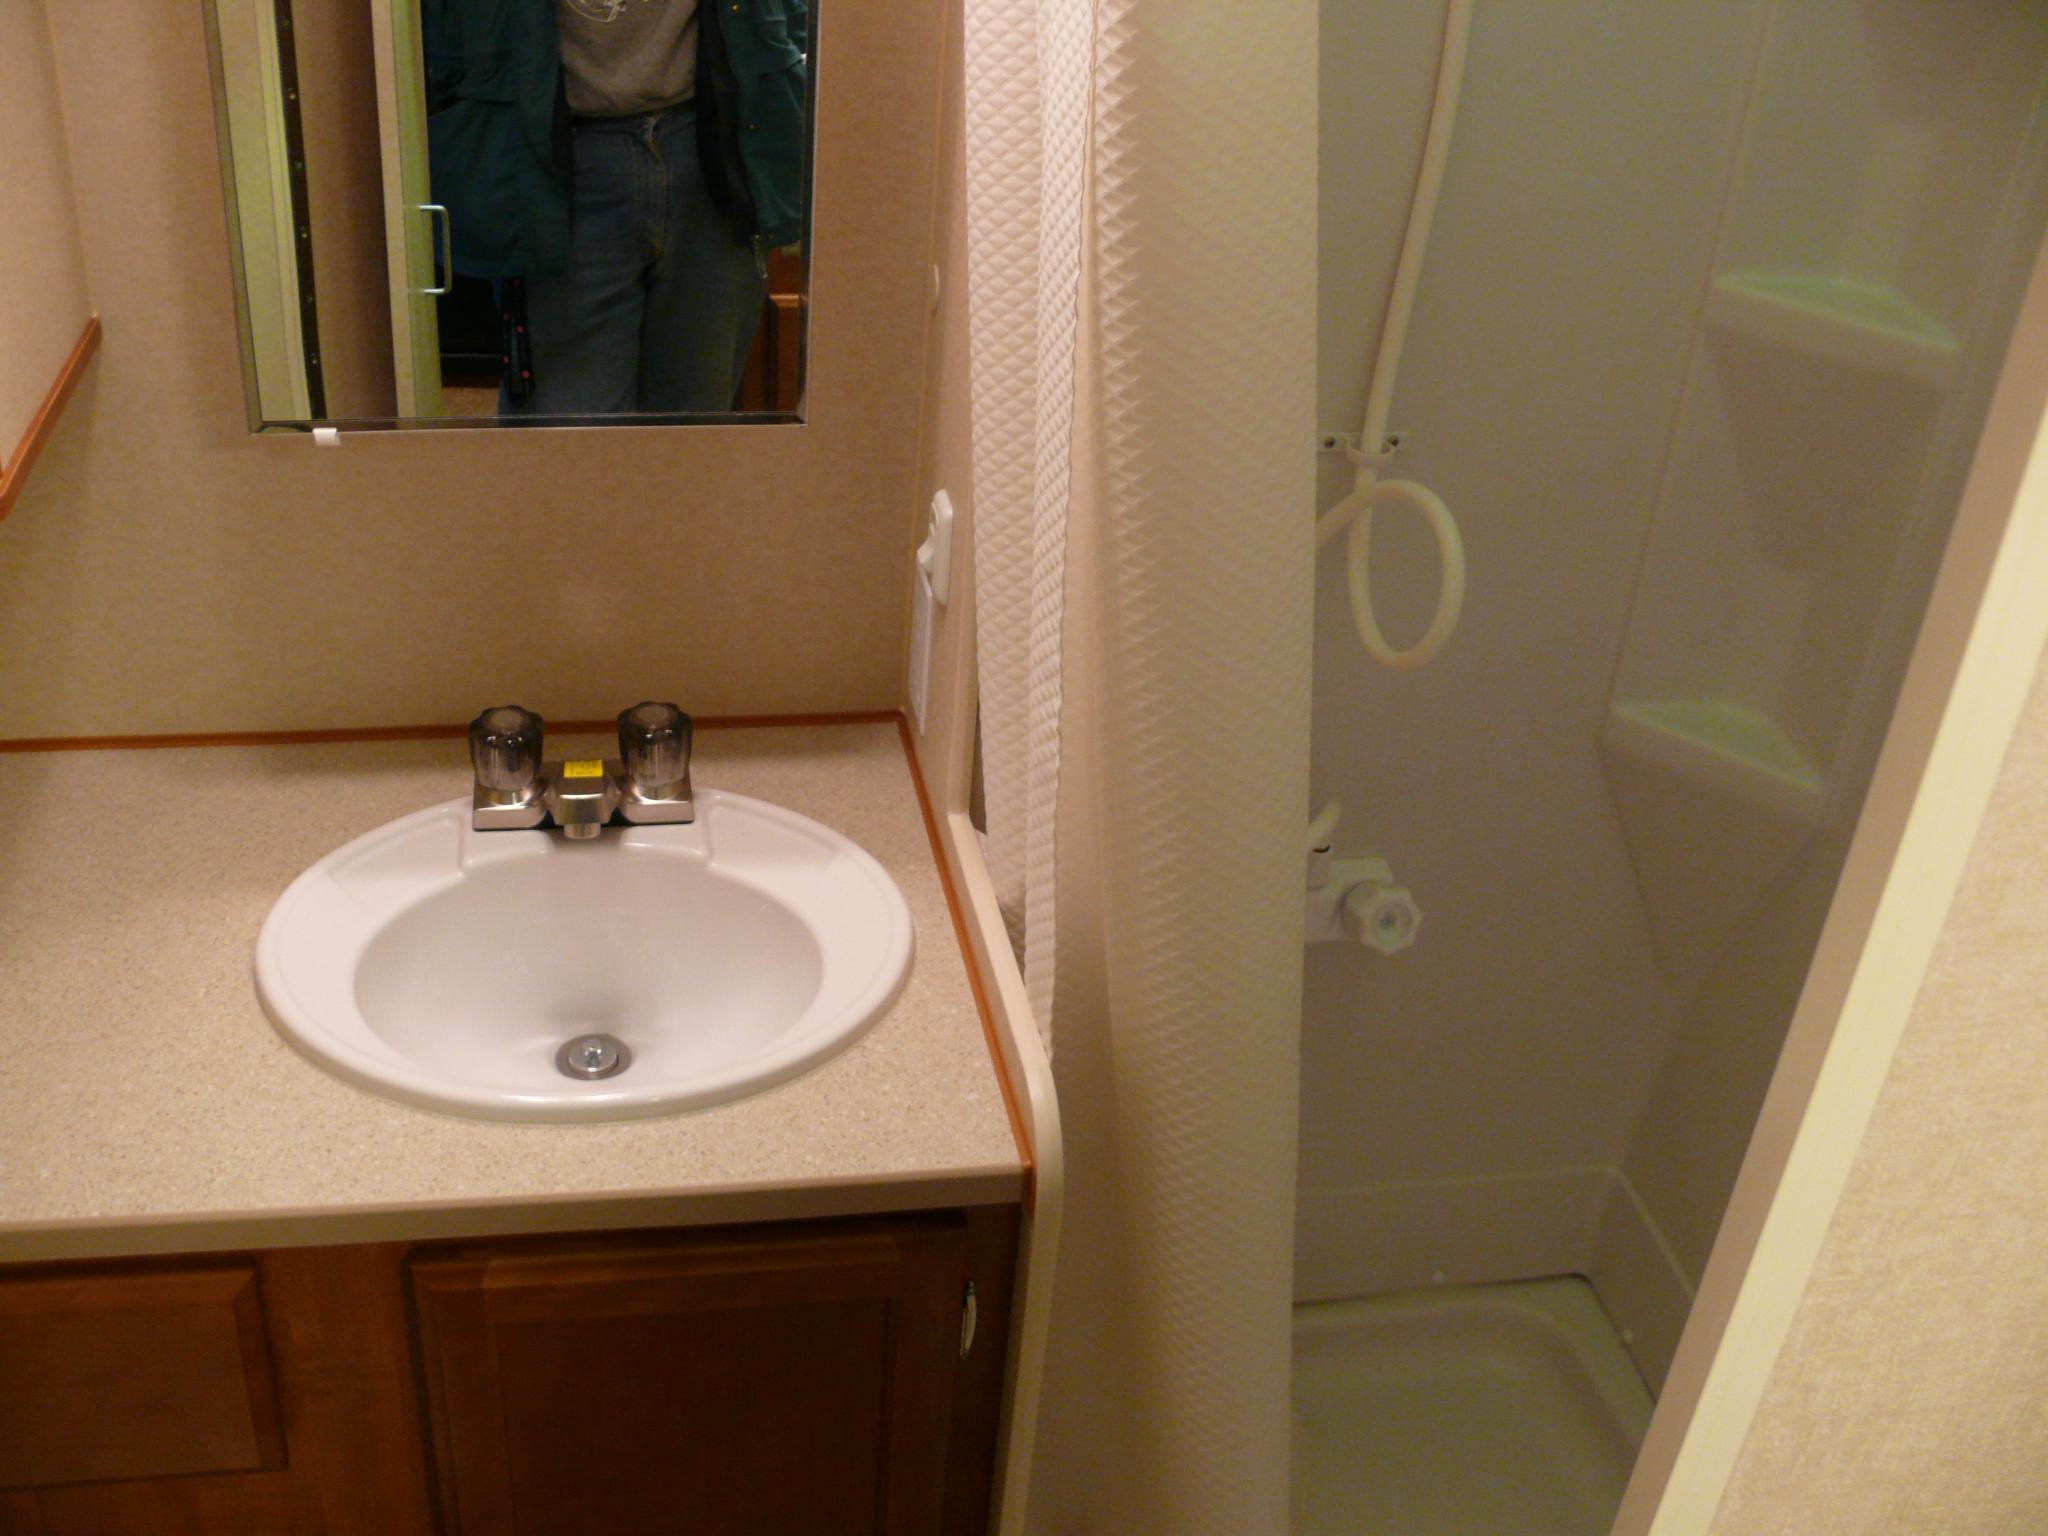 Deep cleaning the RV bathroom